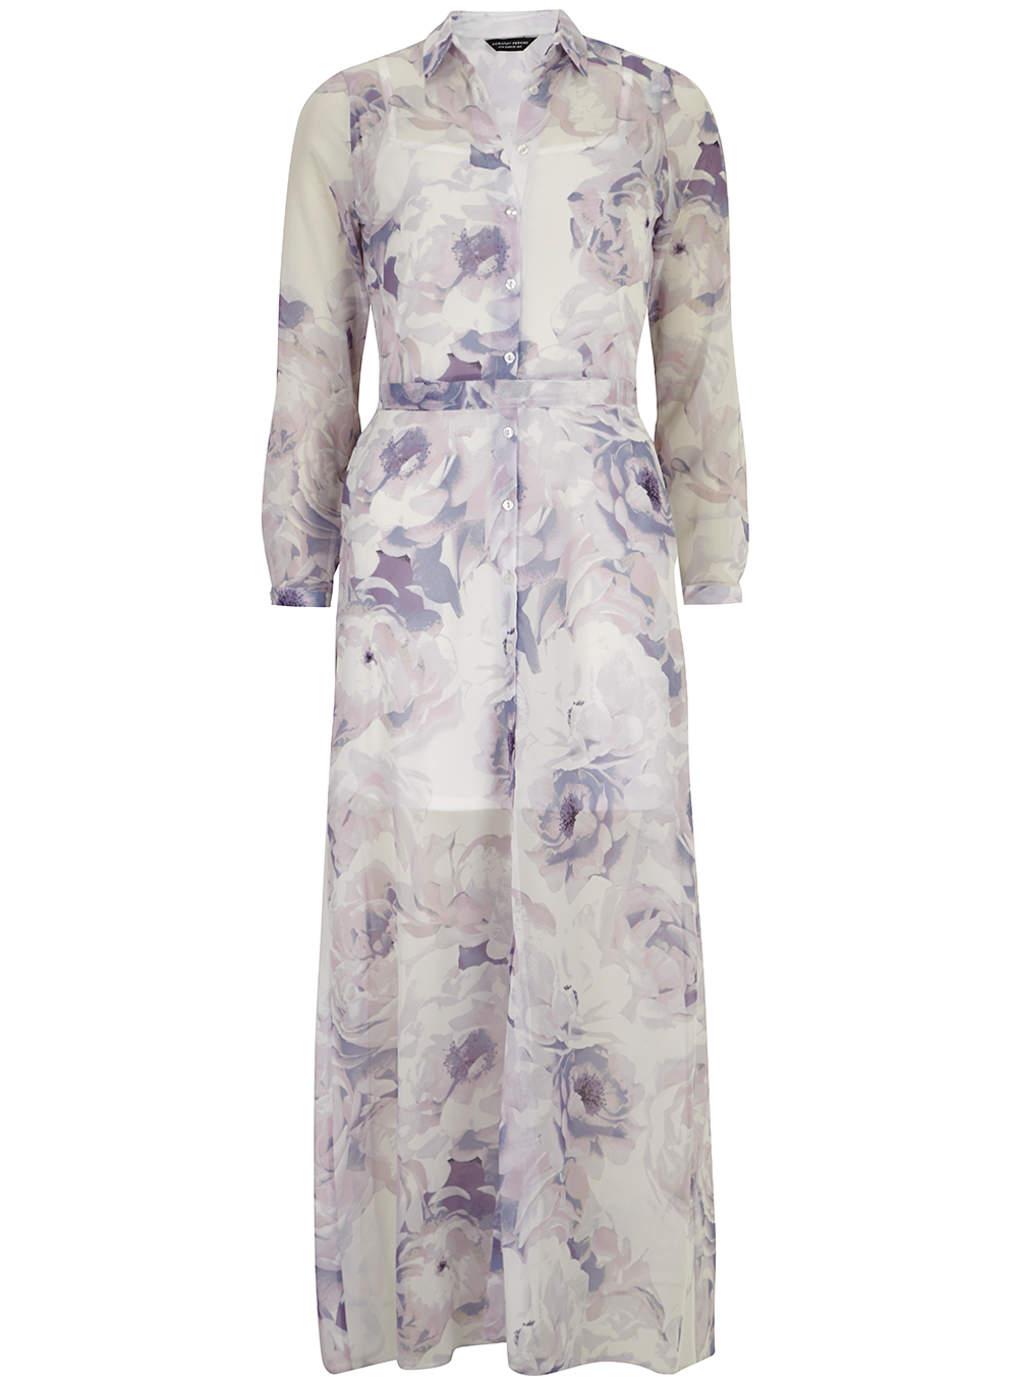 Floral shirt maxi dress